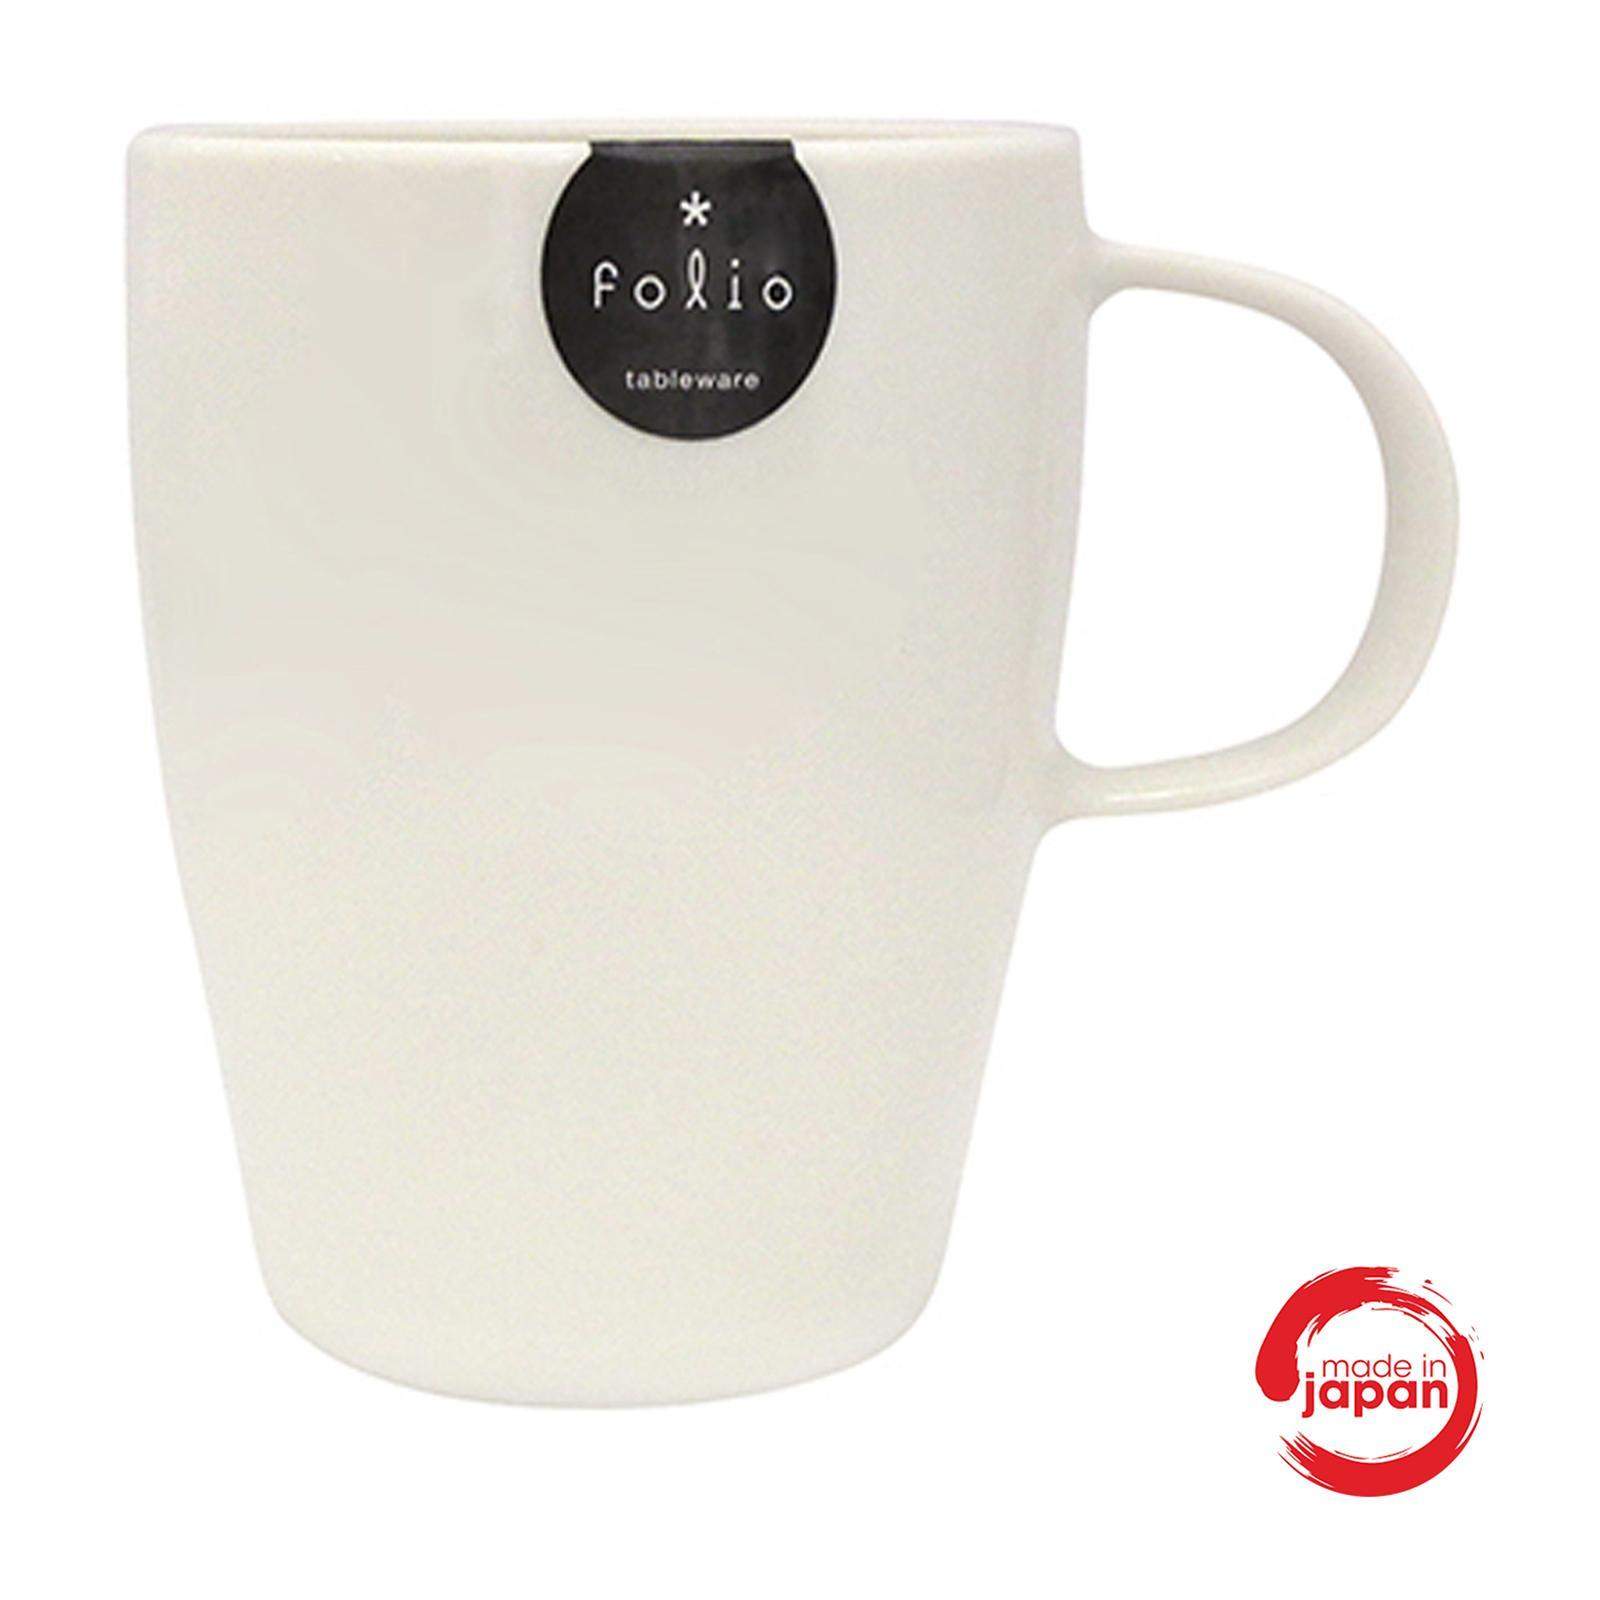 Nomi - Kitchen - Fancy Mug With Handle - White Color